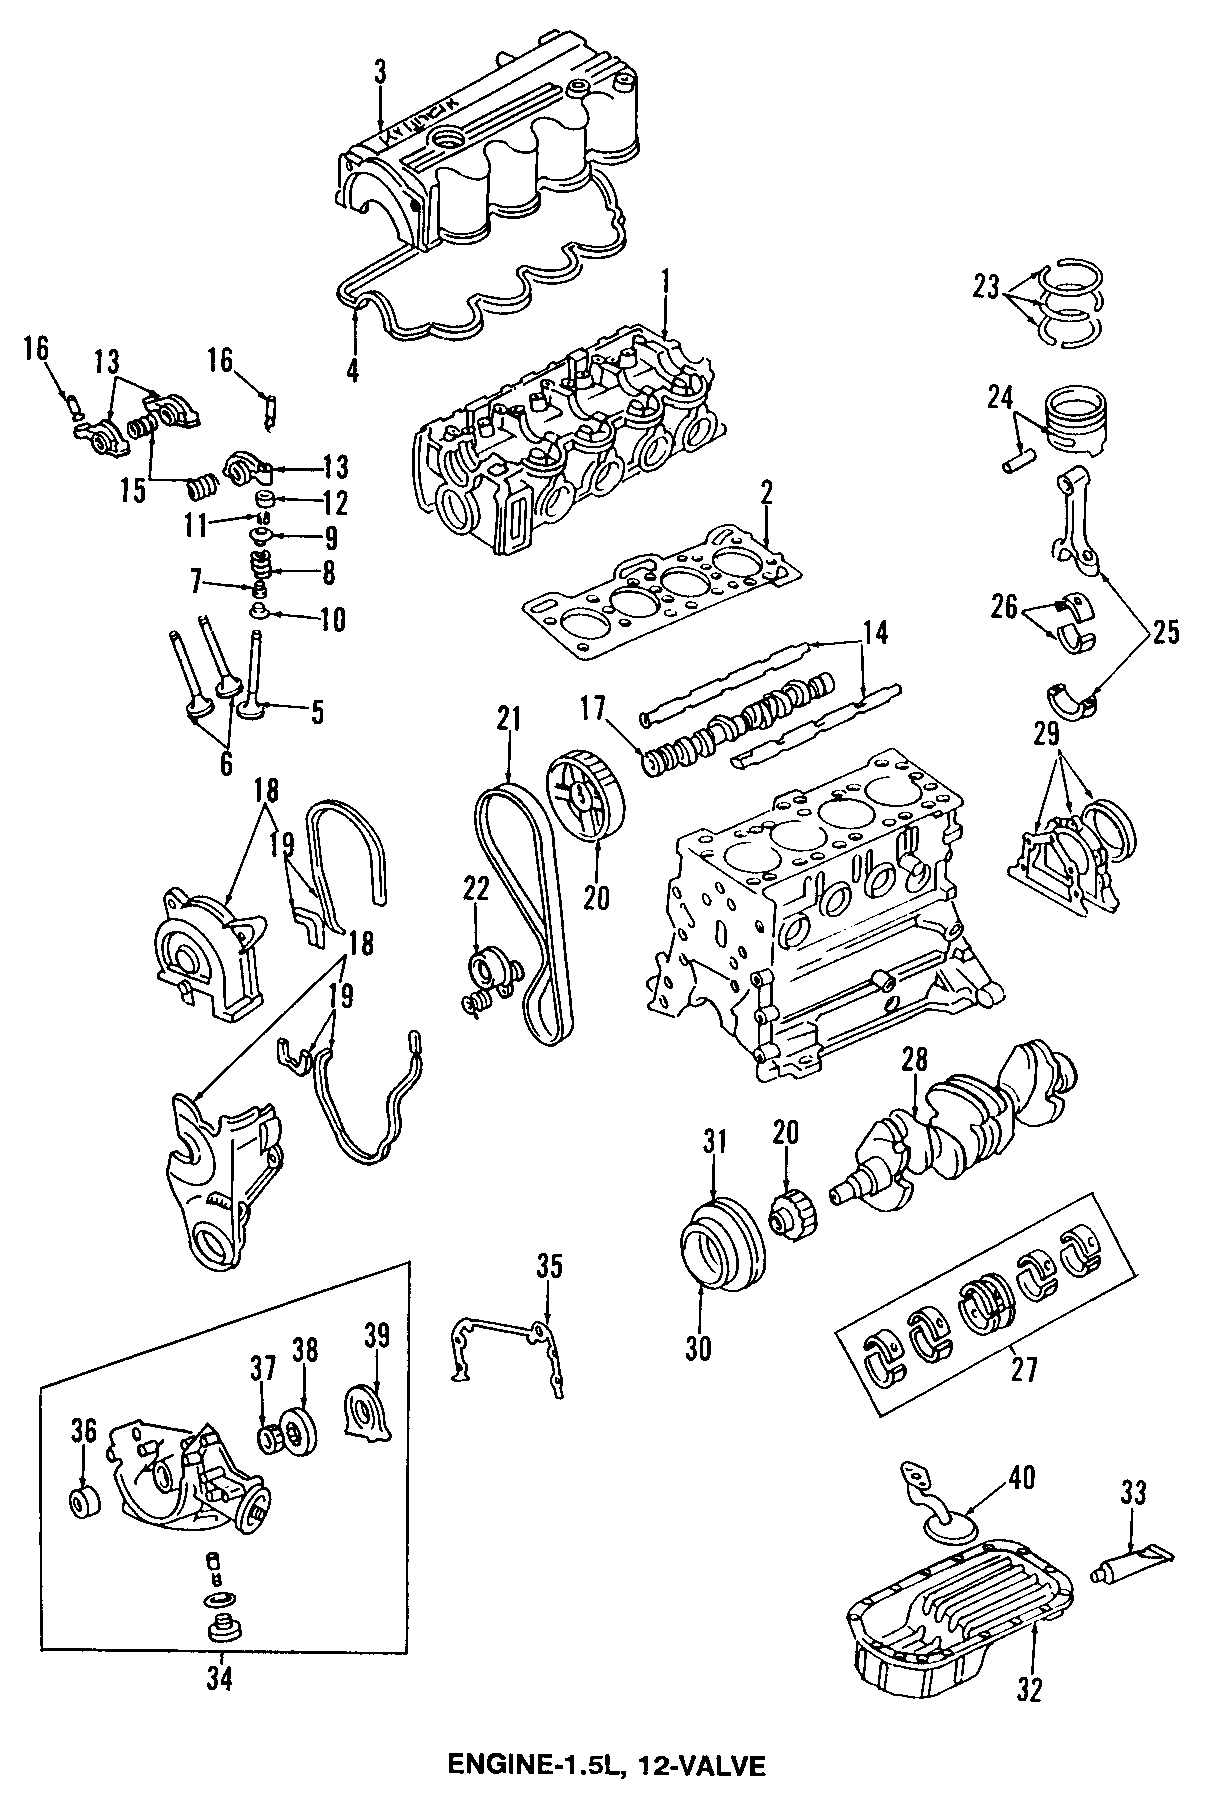 2009 Hyundai Accent Engine Timing Camshaft Sprocket